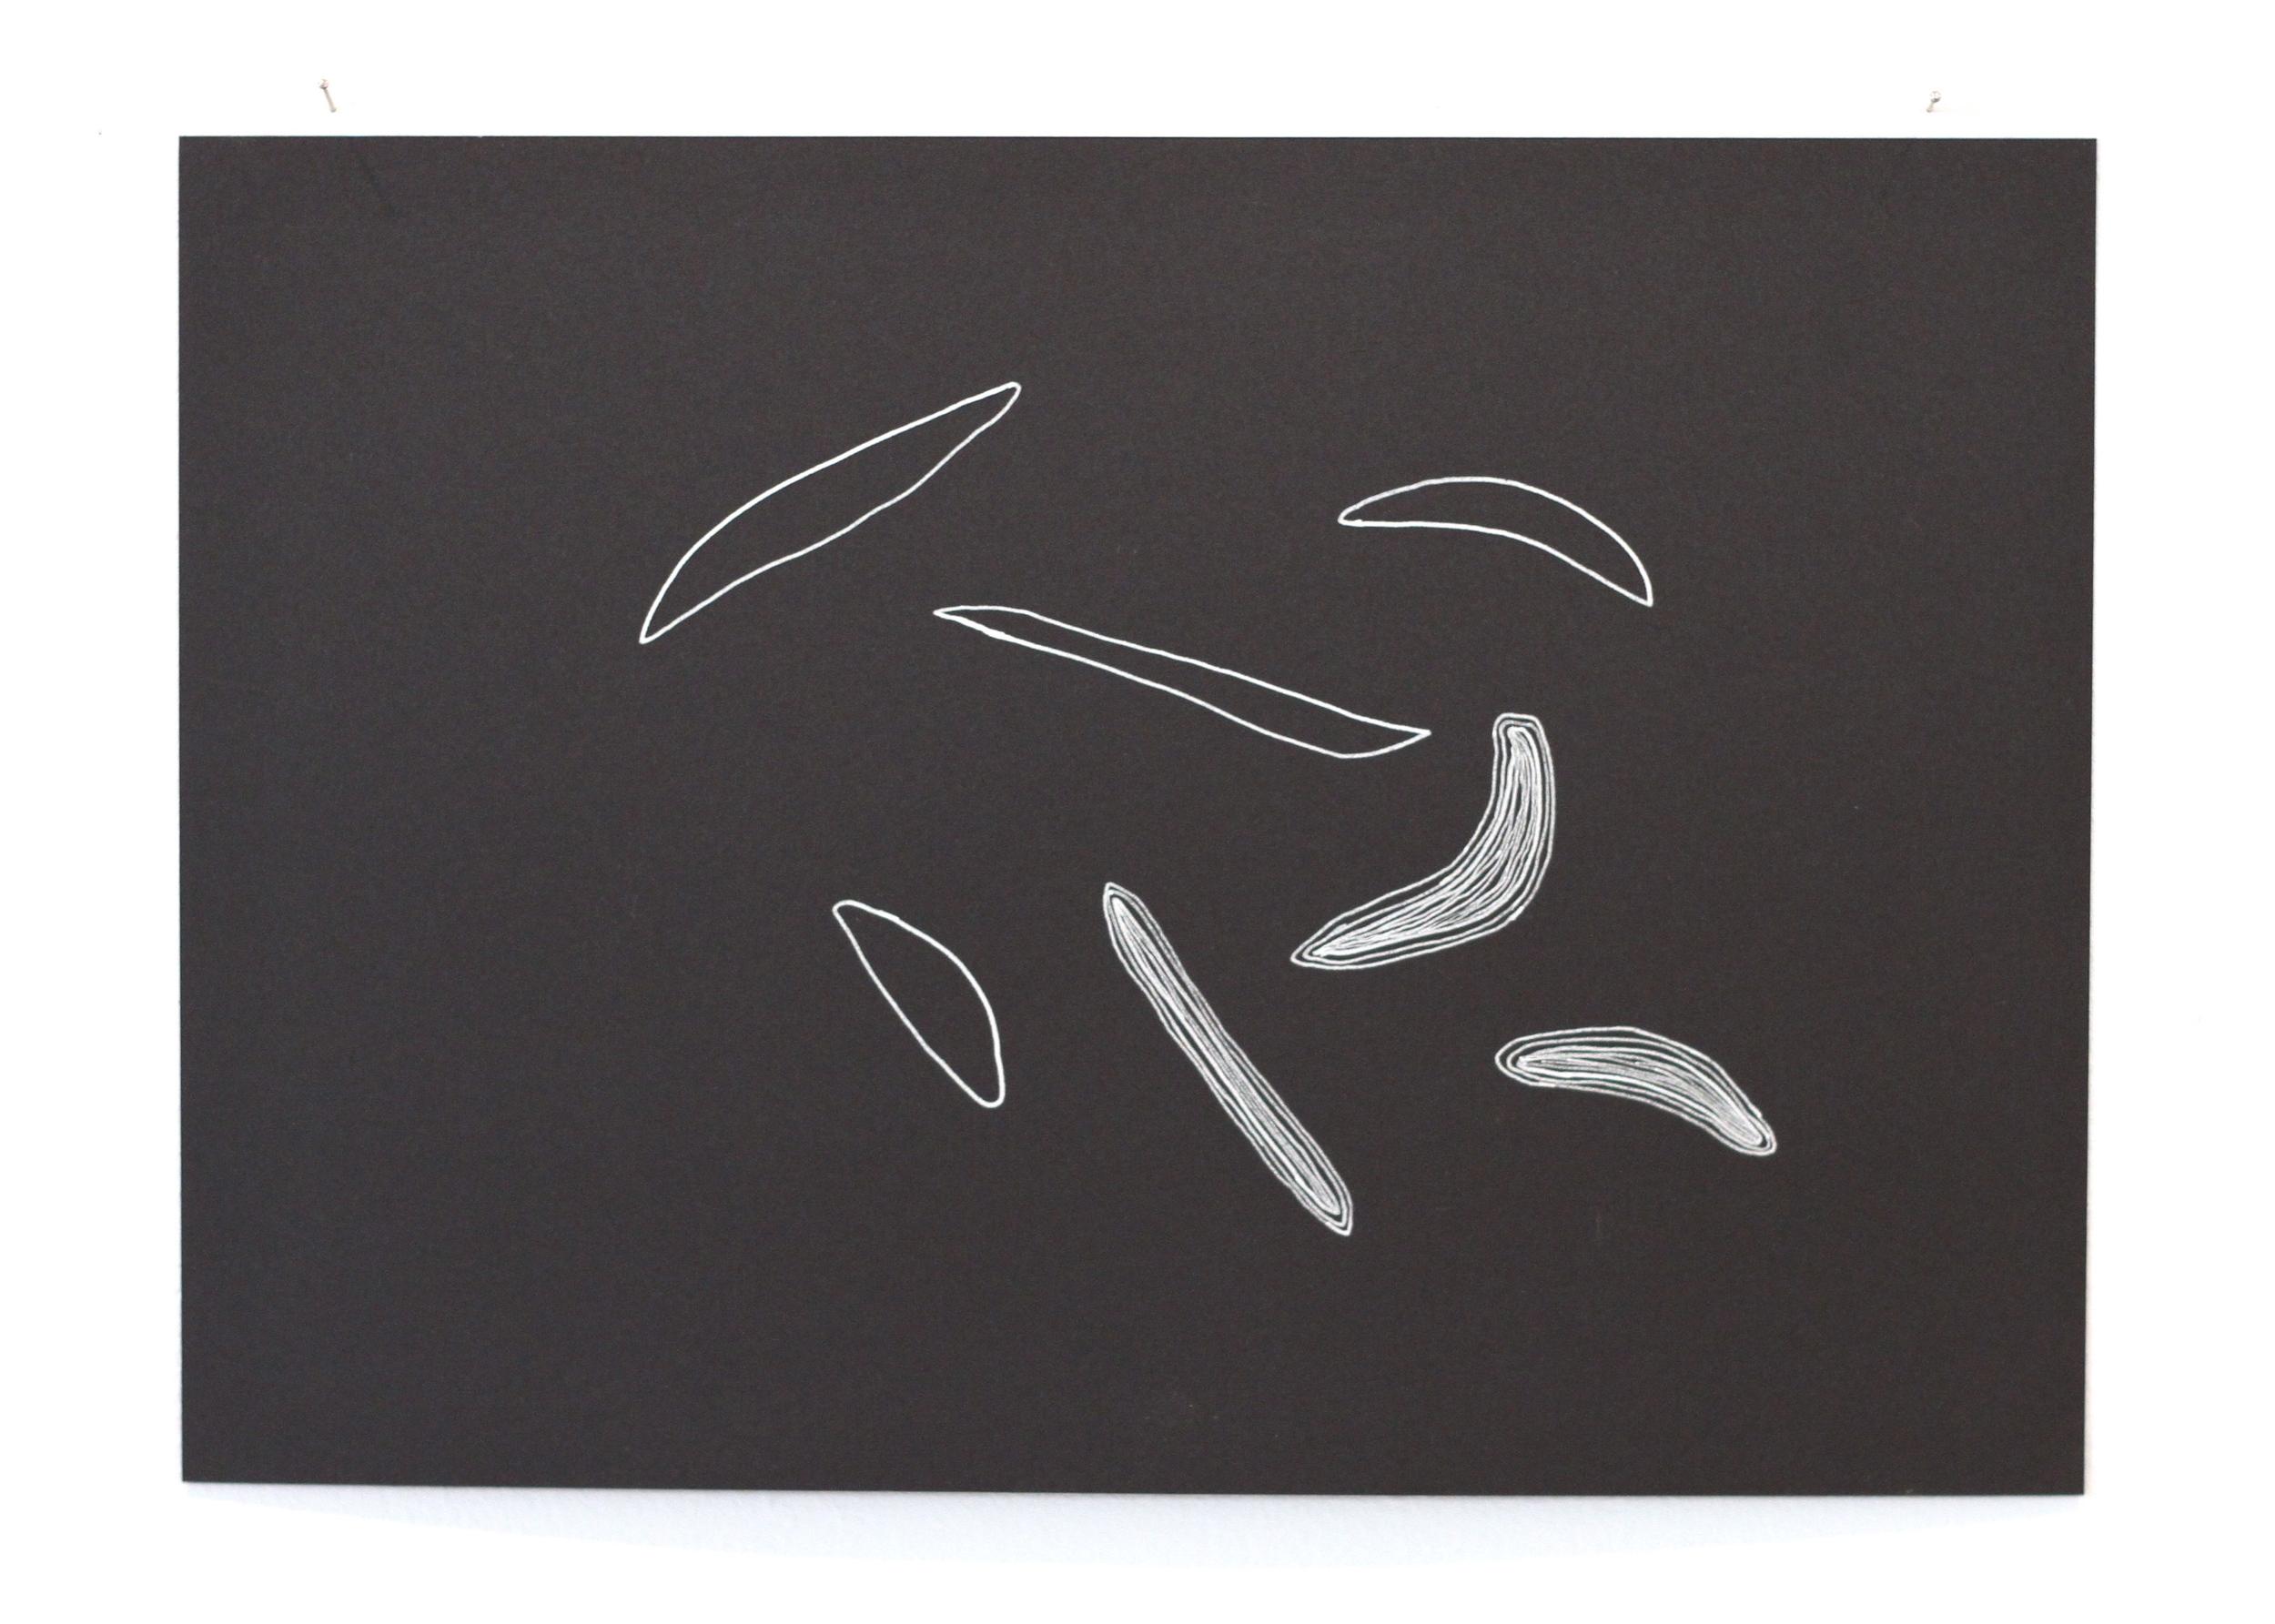 Ān fenjān hāye chāi ke bā ham nanooshidim / Those cups of tea we didn't share 3, Léuli Eshraghi, ink on card, 21 x 29.5cm, 2014